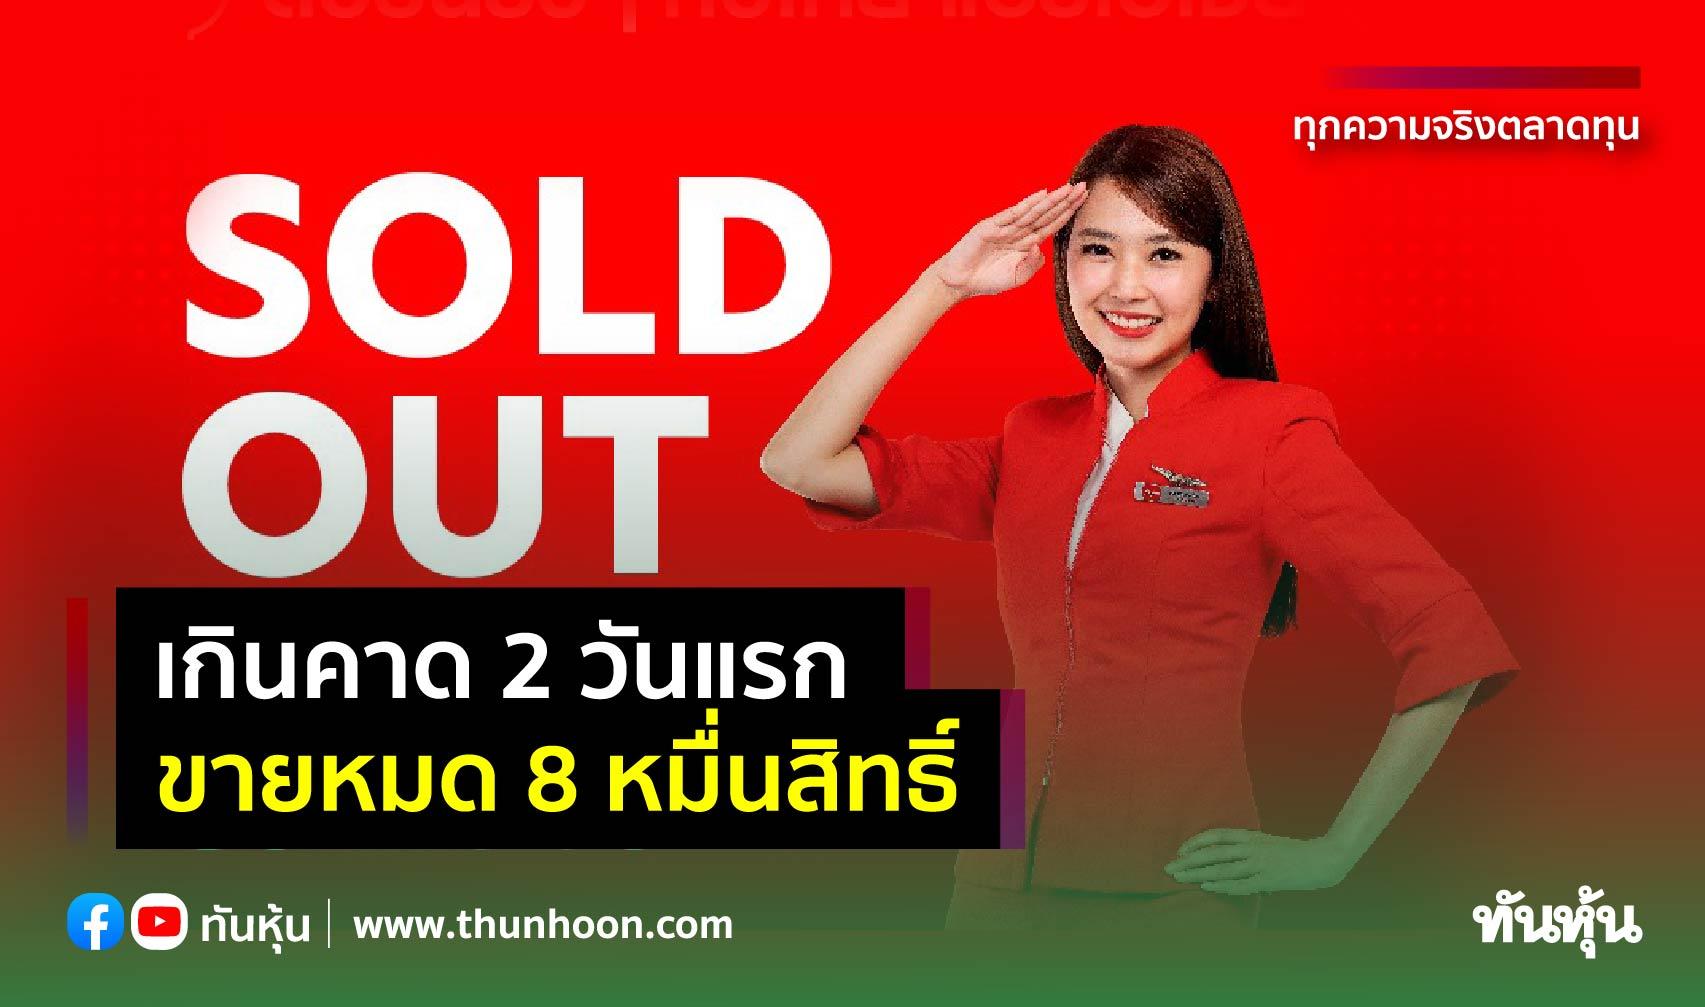 "AAV เผย""ตั๋วบินรัวๆ ทั่วไทย"" ขายหมด 8 หมื่นสิทธิ์ใน 2 วัน"